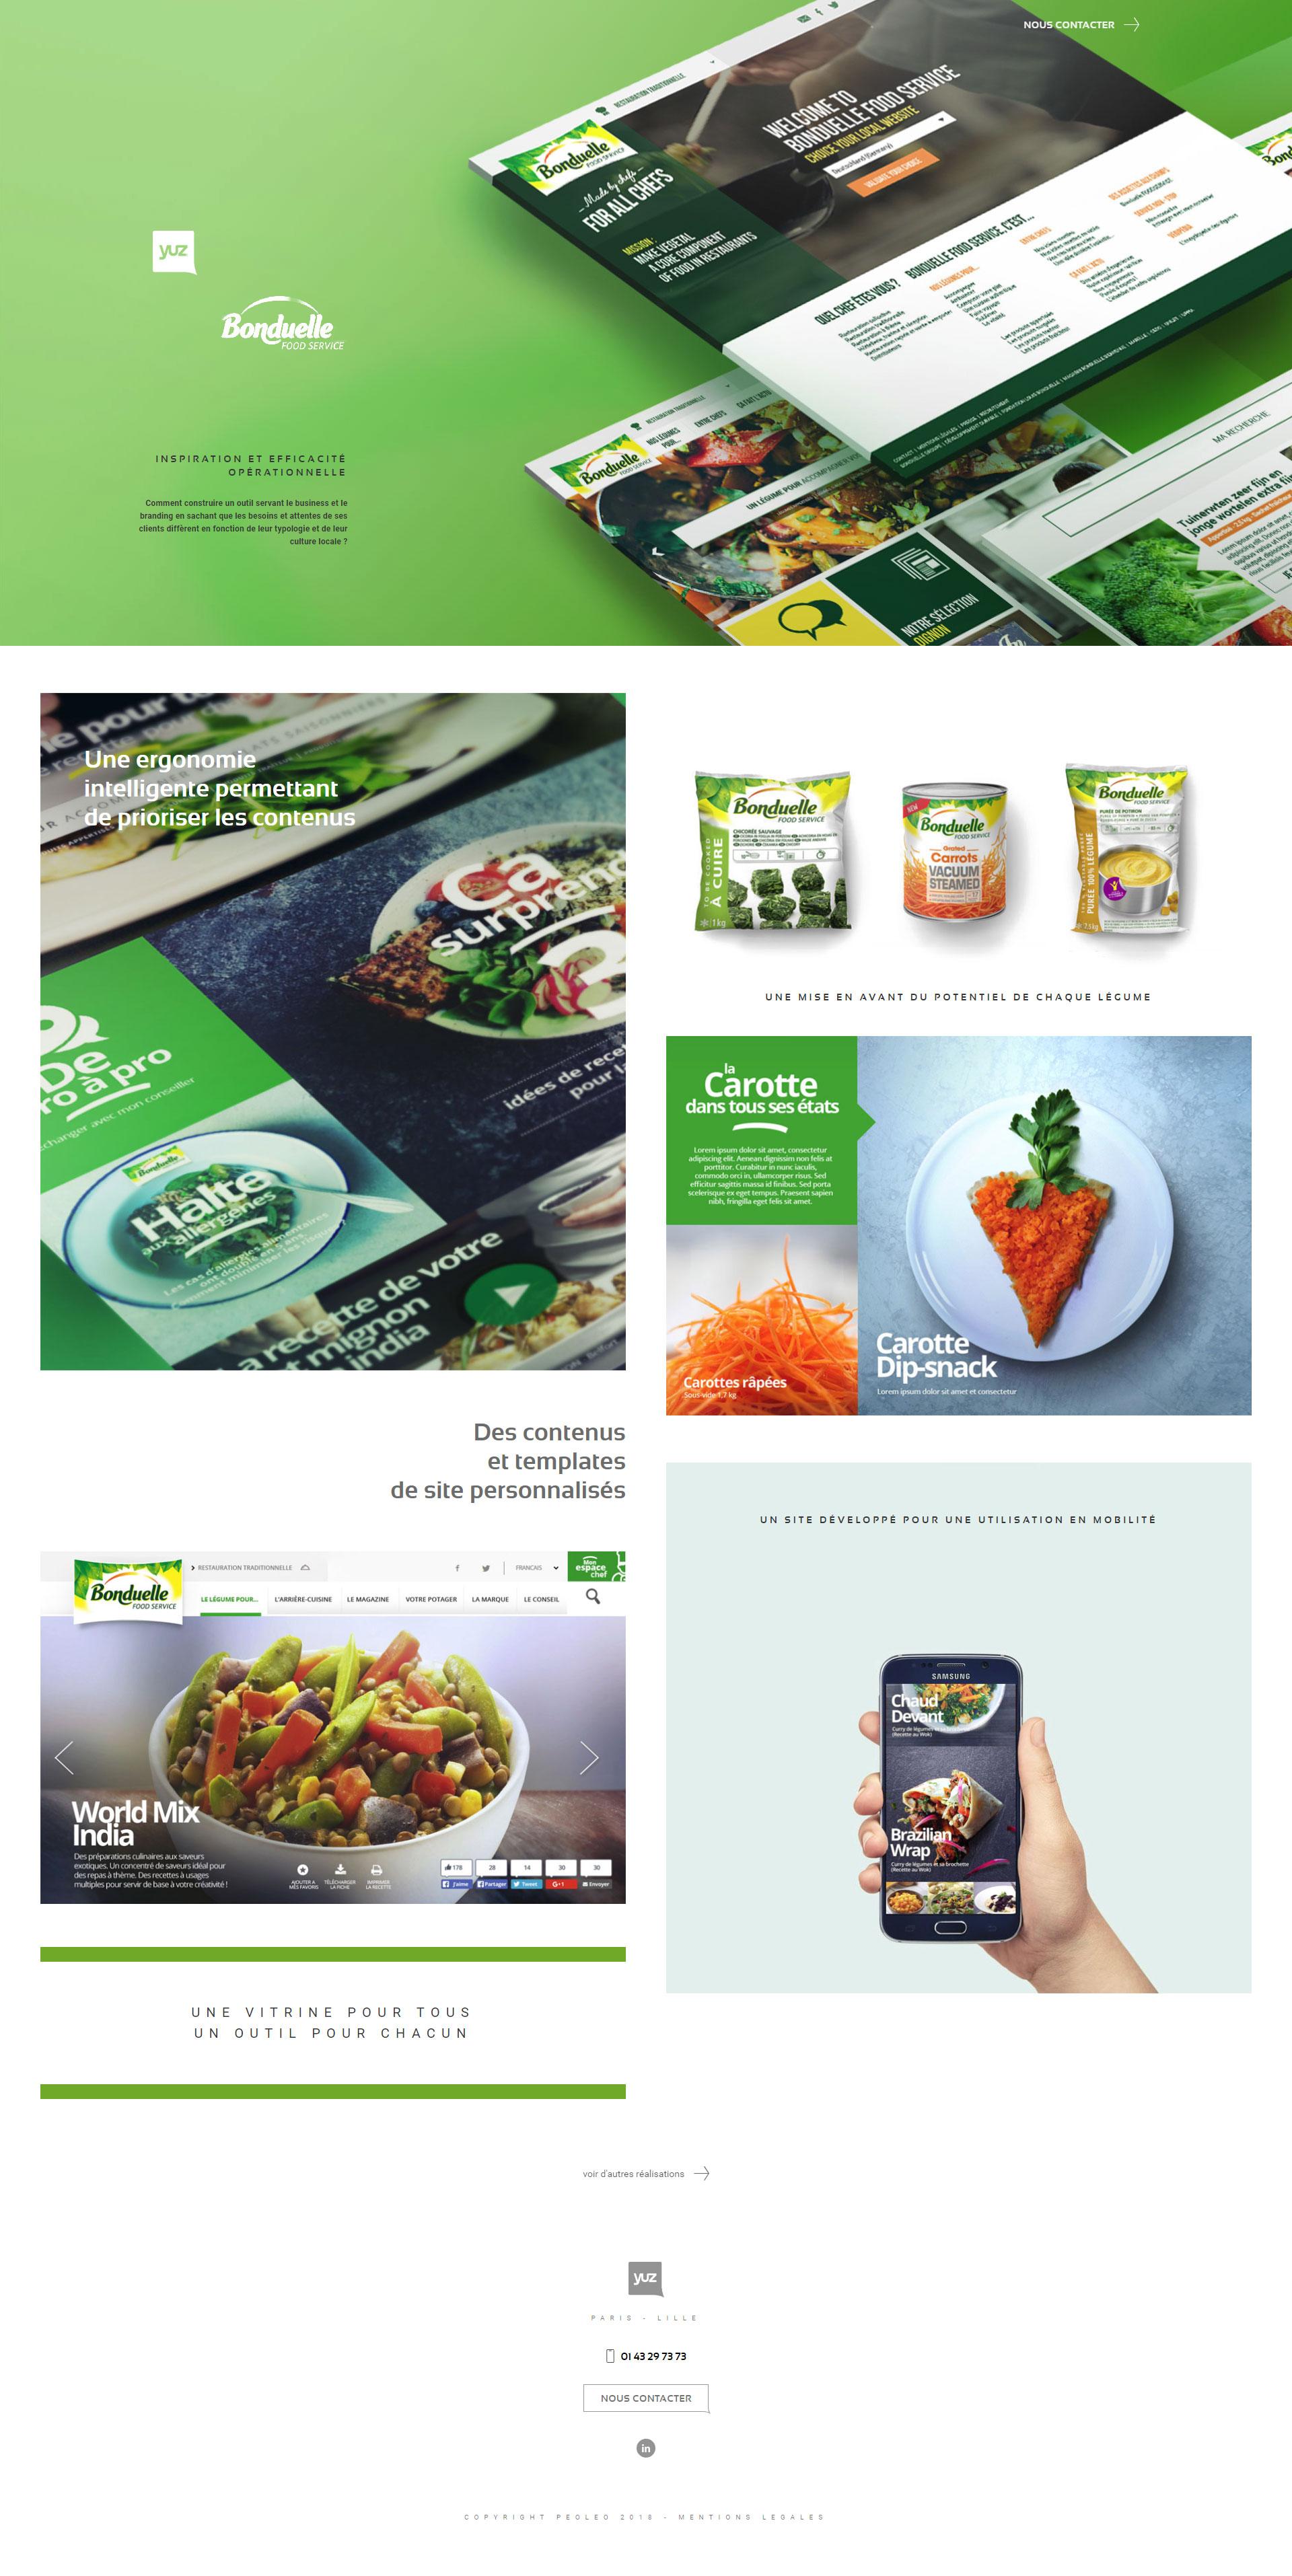 https://www.fabienrodrigues.com/YUZ - Bonduelle Food Service